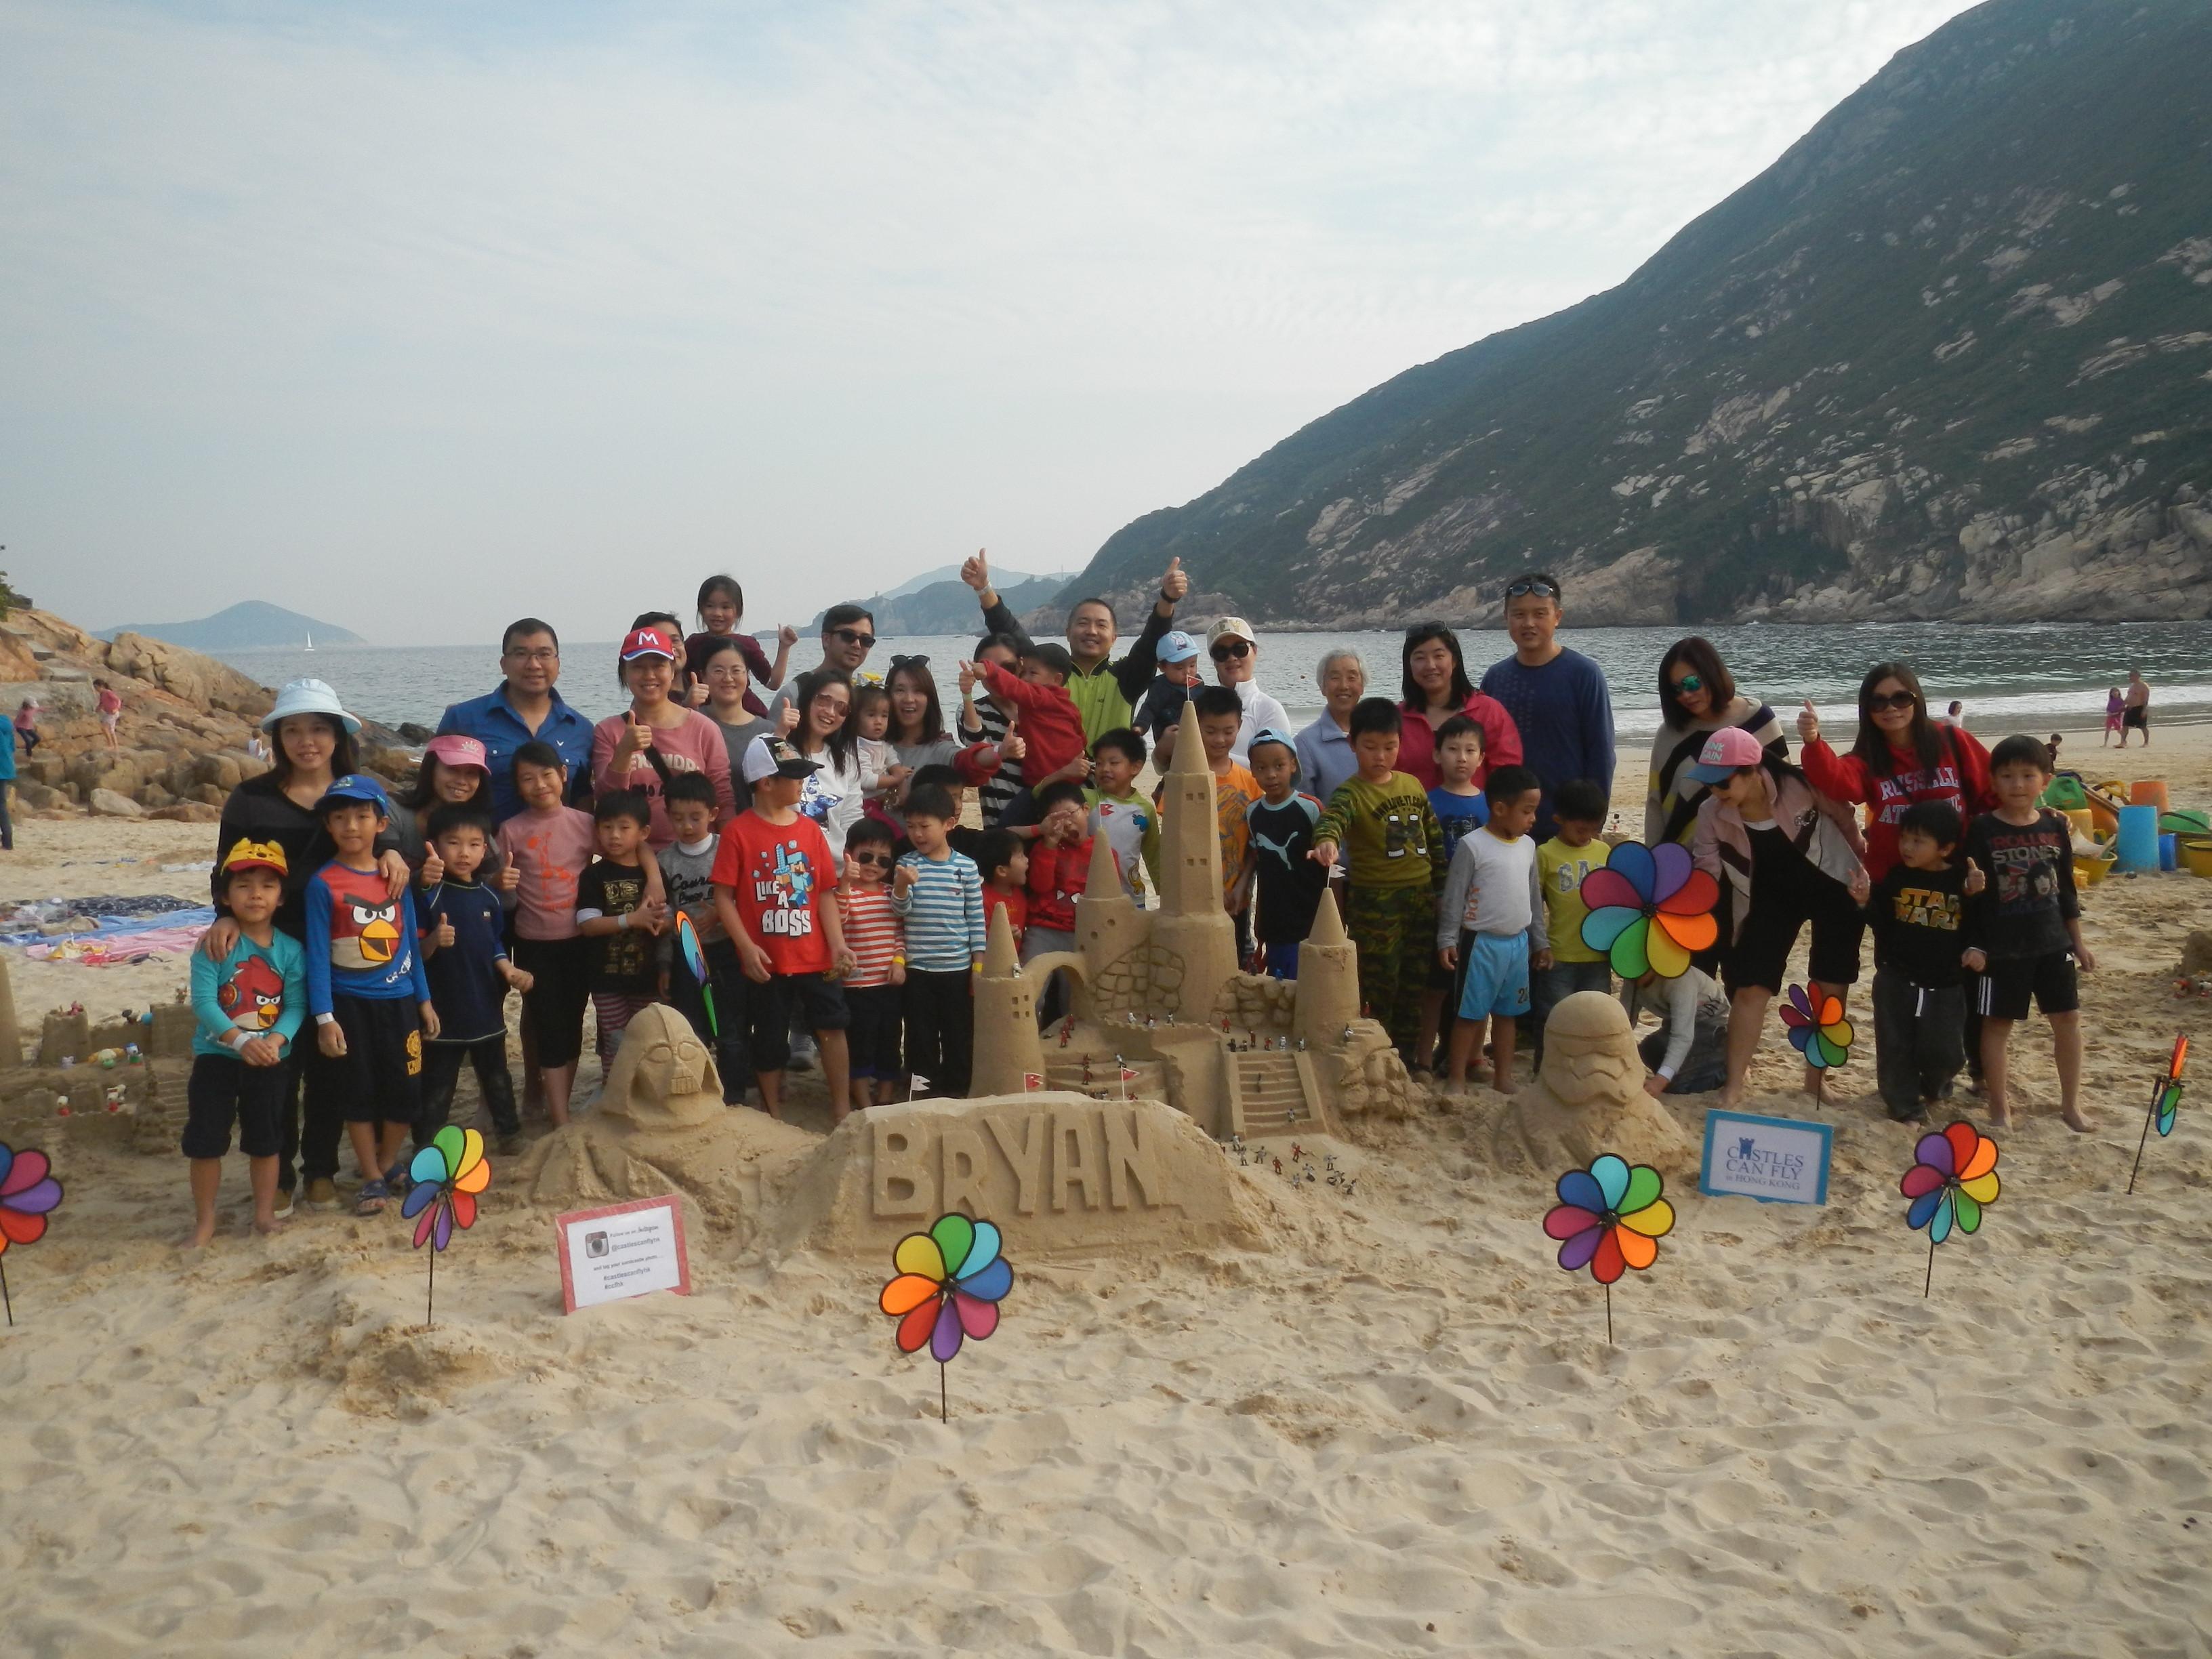 Private sandcastle party